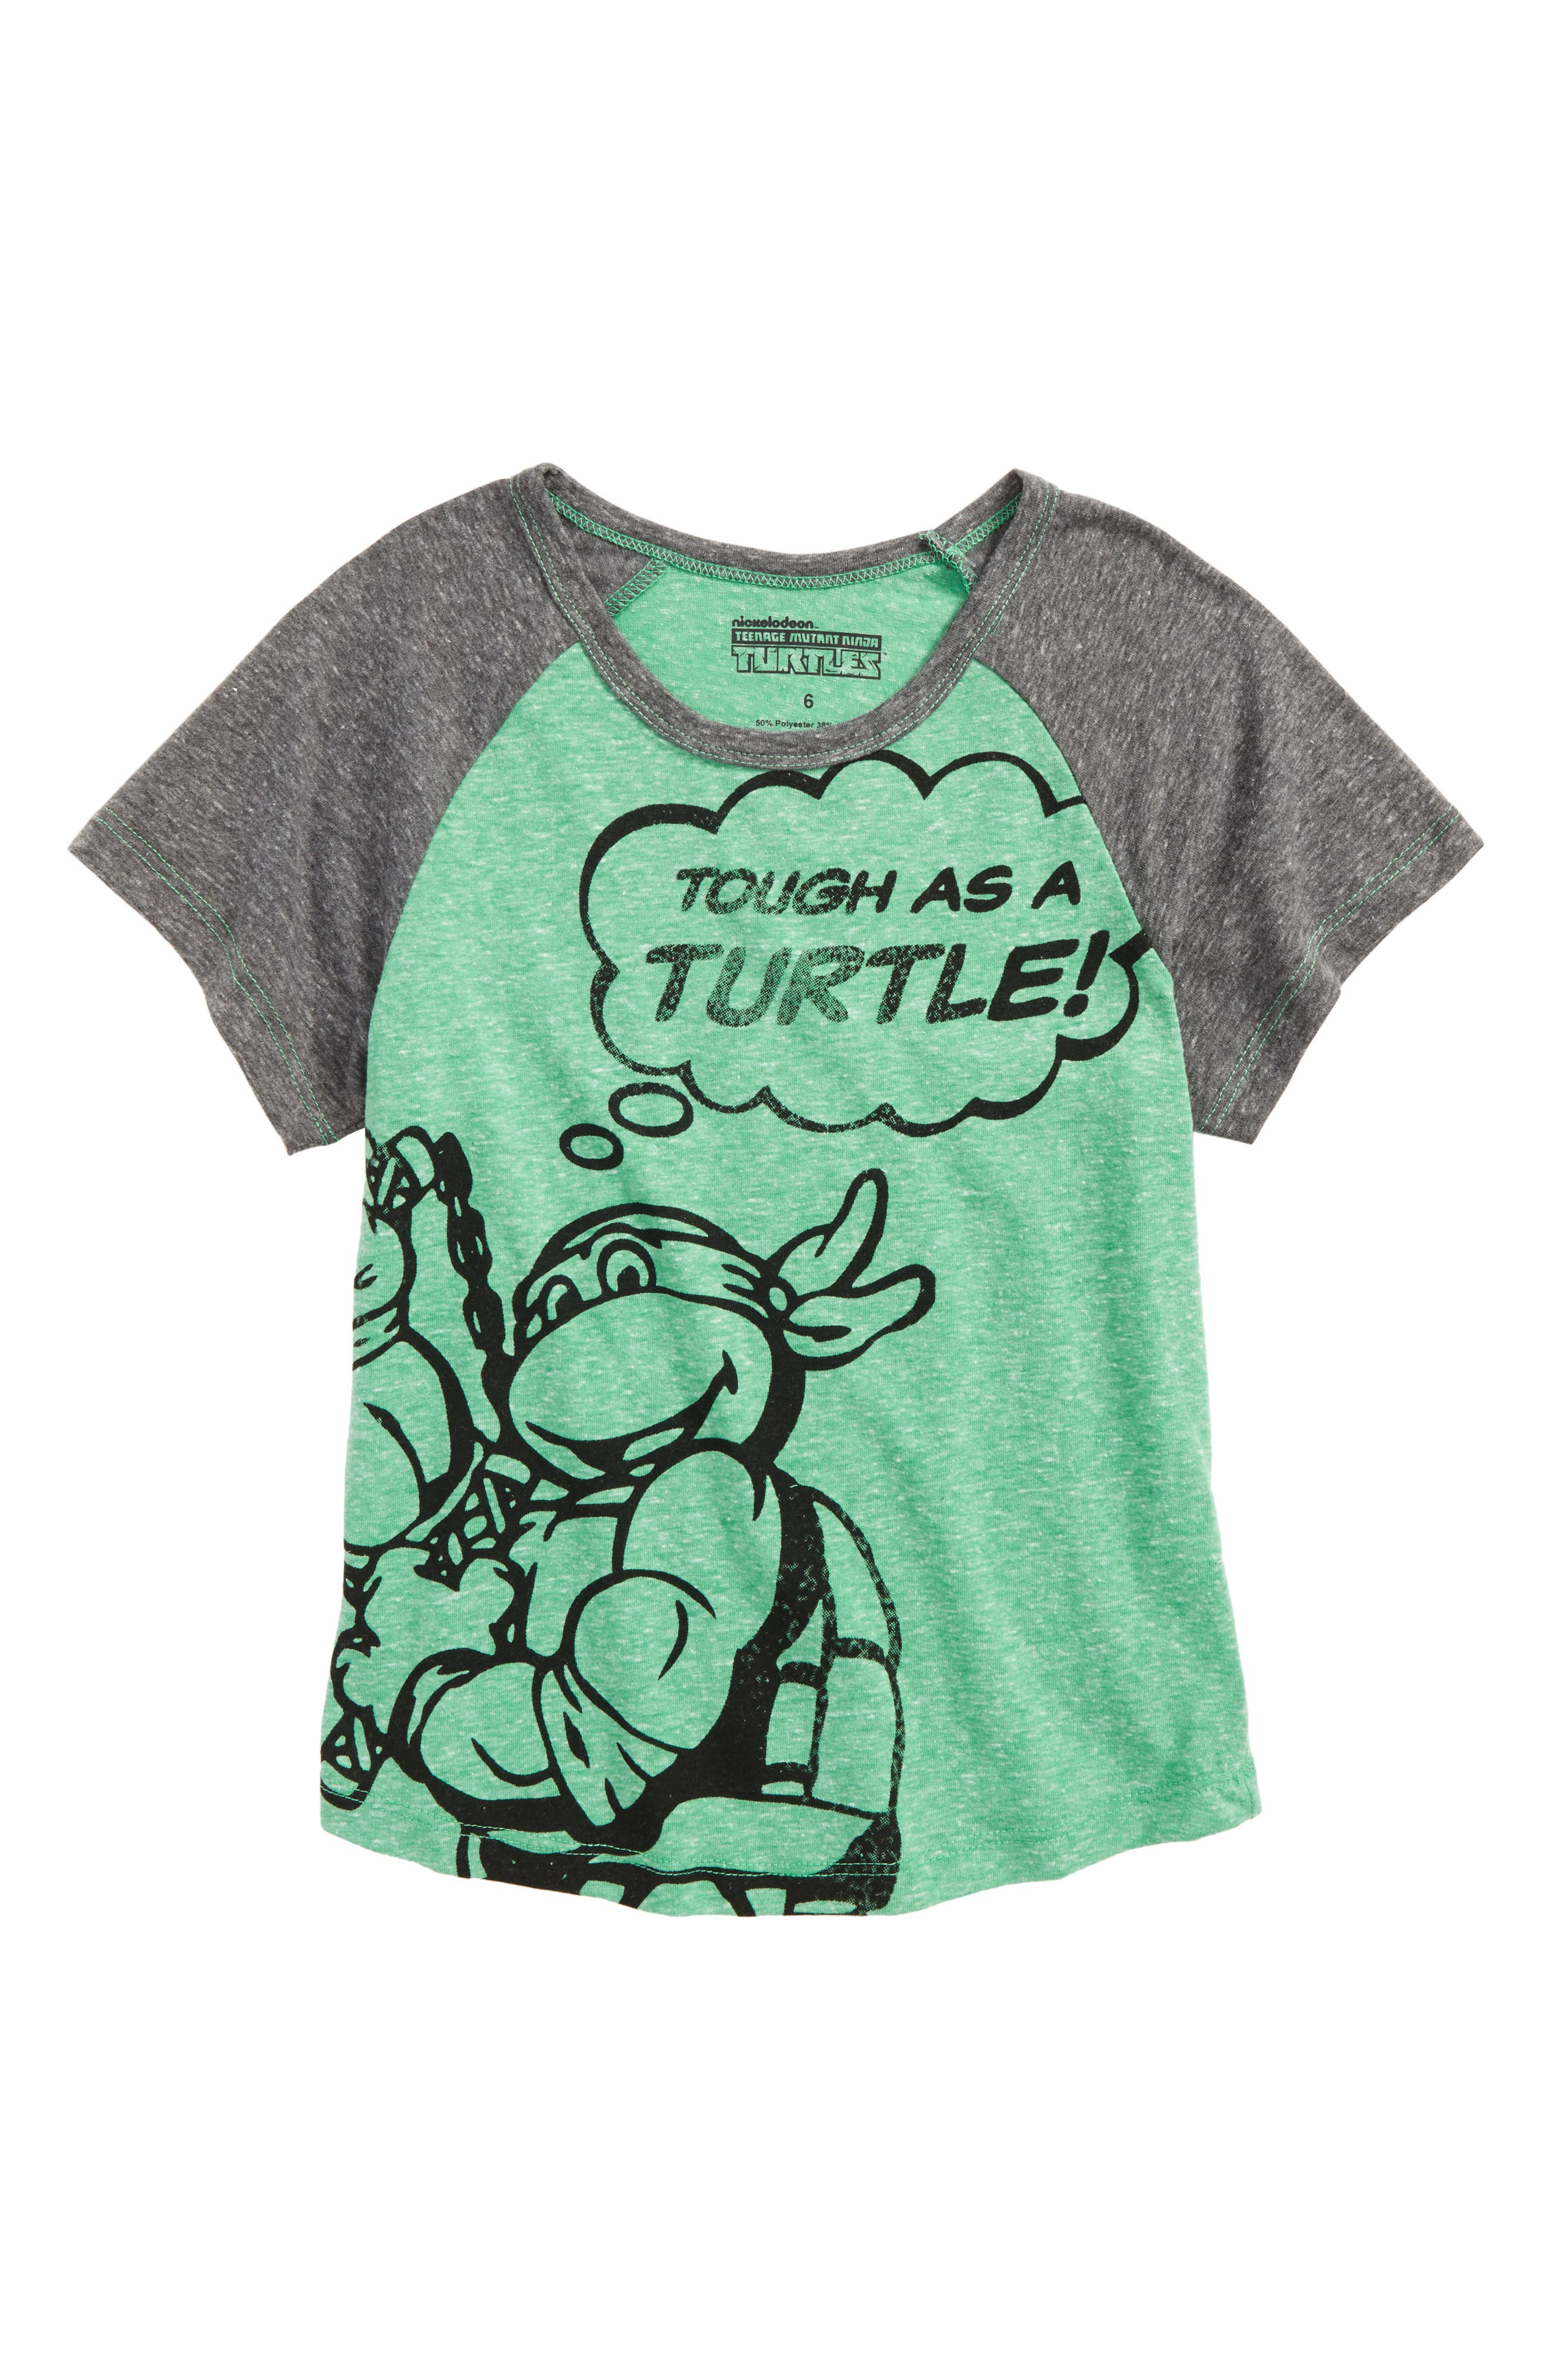 TMNT - Tough as a Turtle Graphic T-Shirt,                             Main thumbnail 1, color,                             300